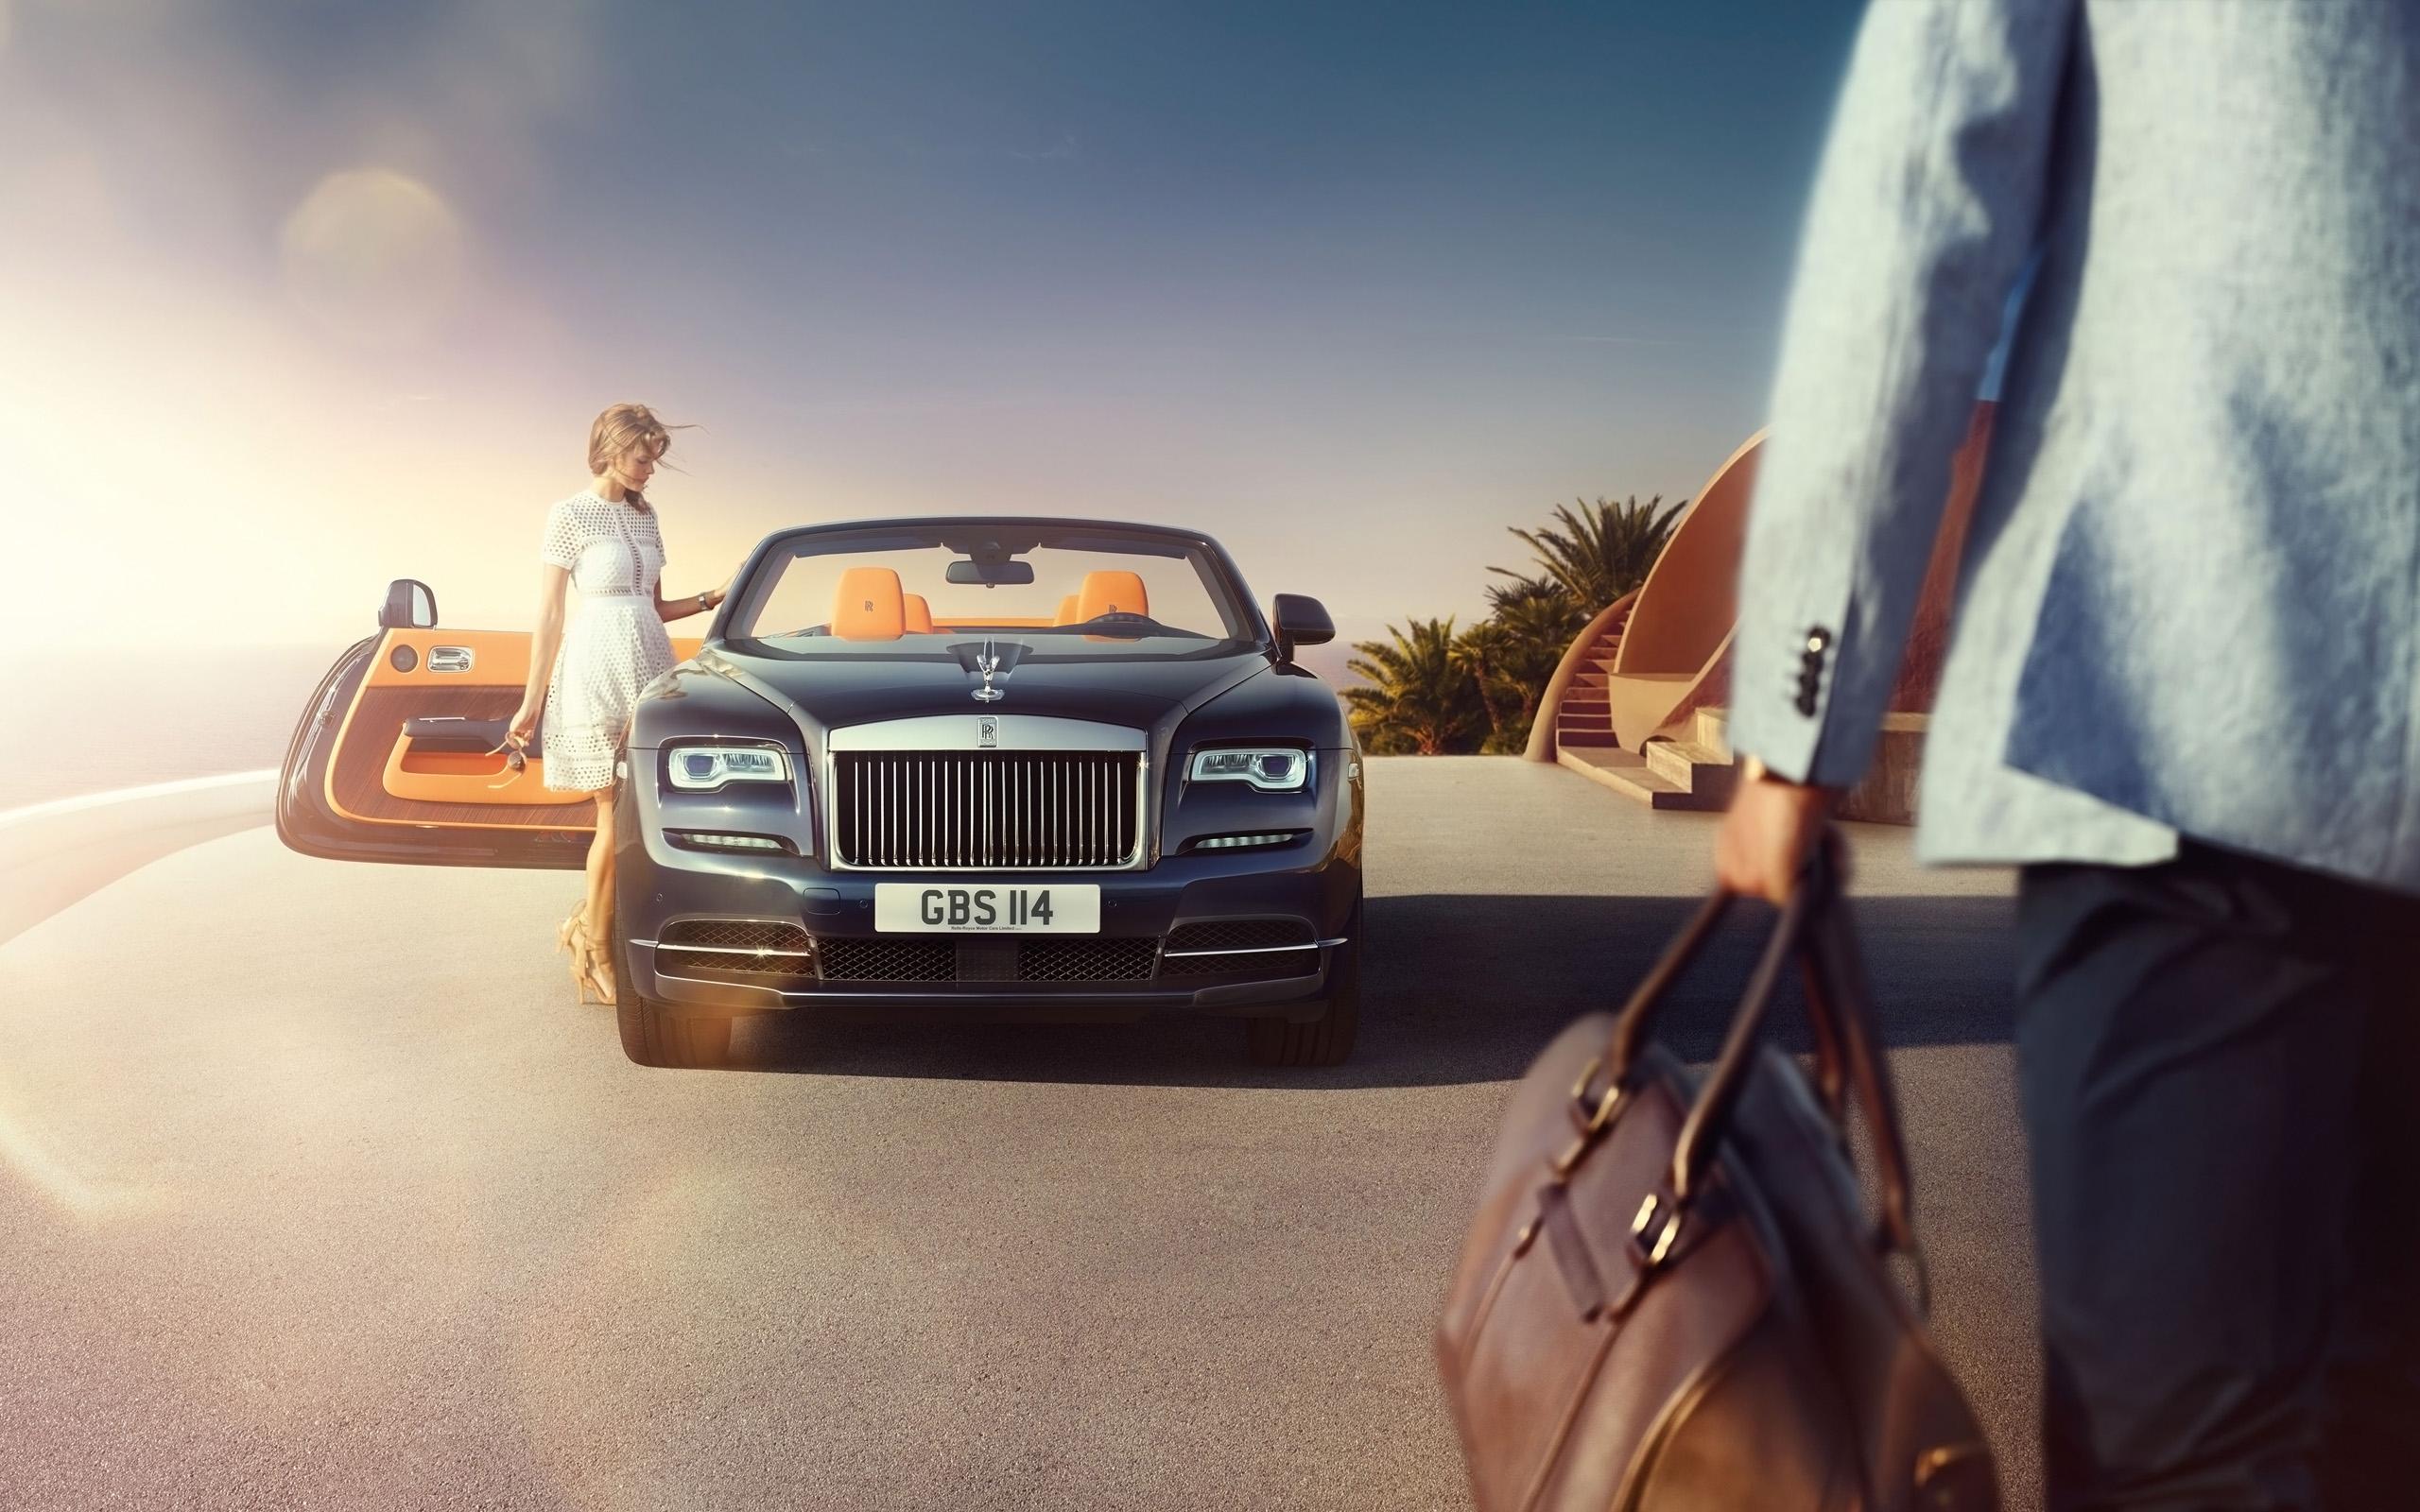 2016 Rolls Royce Dawn Wallpaper | HD Car Wallpapers